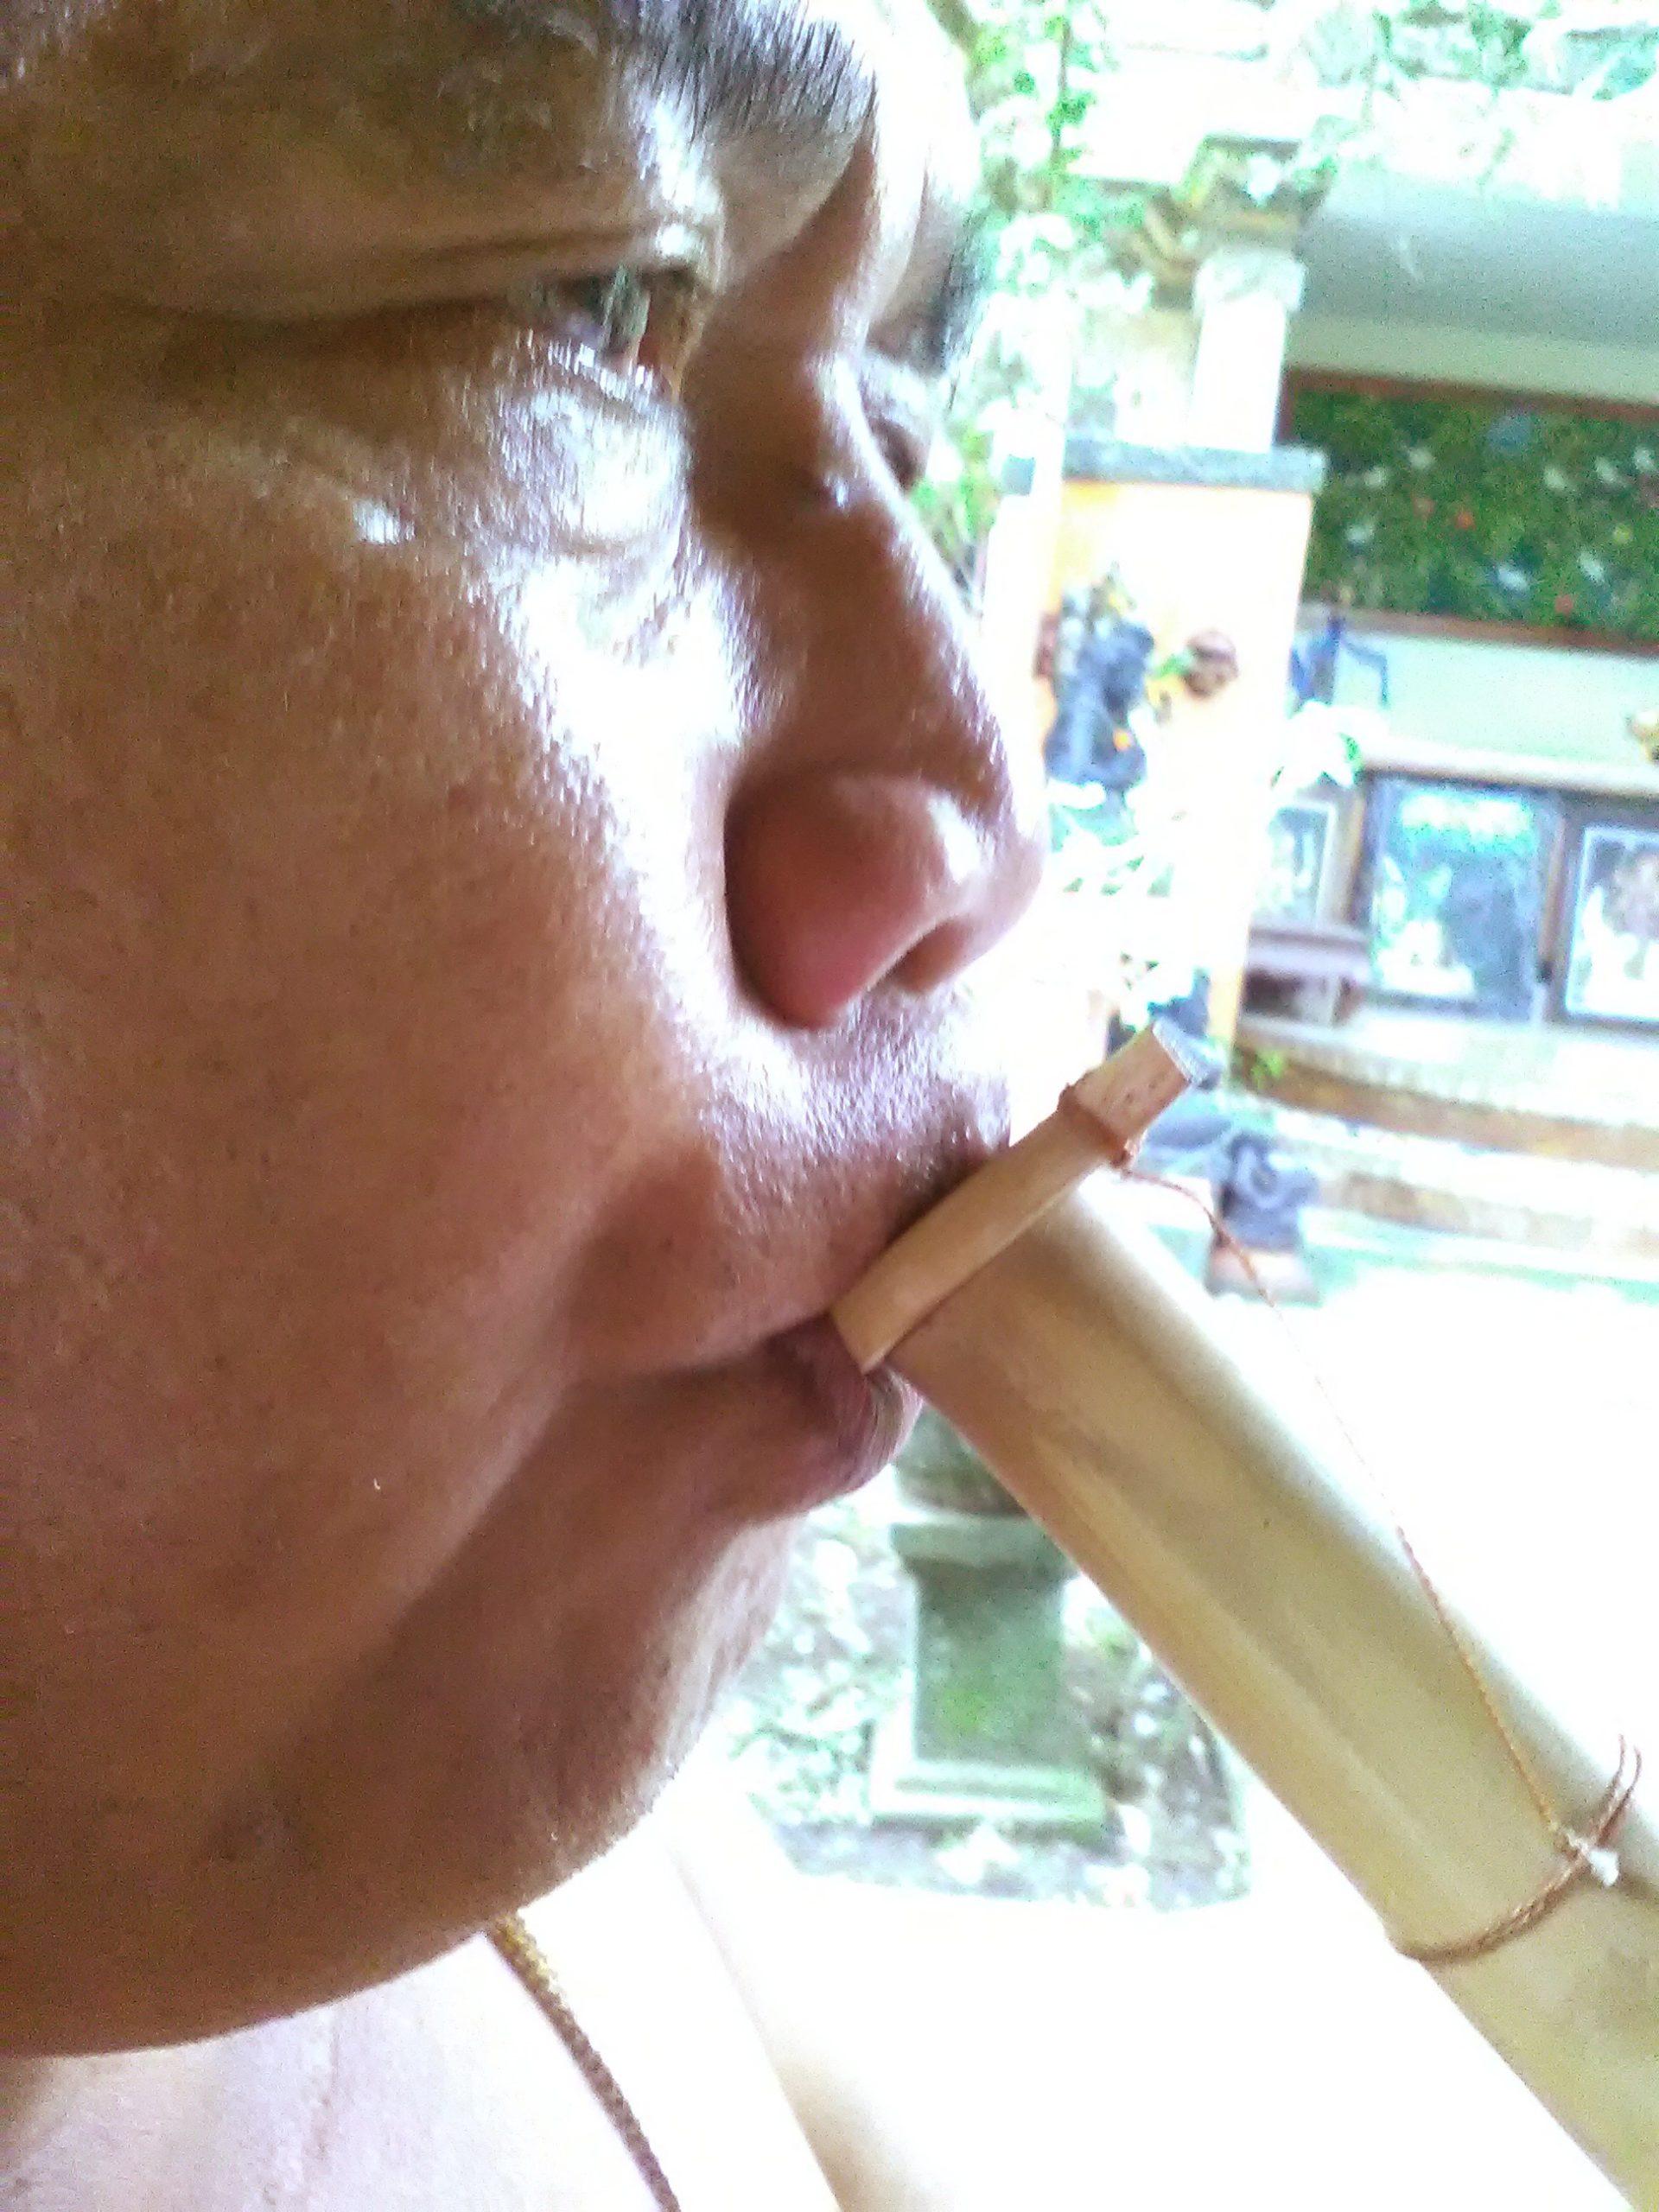 Suling de Bali